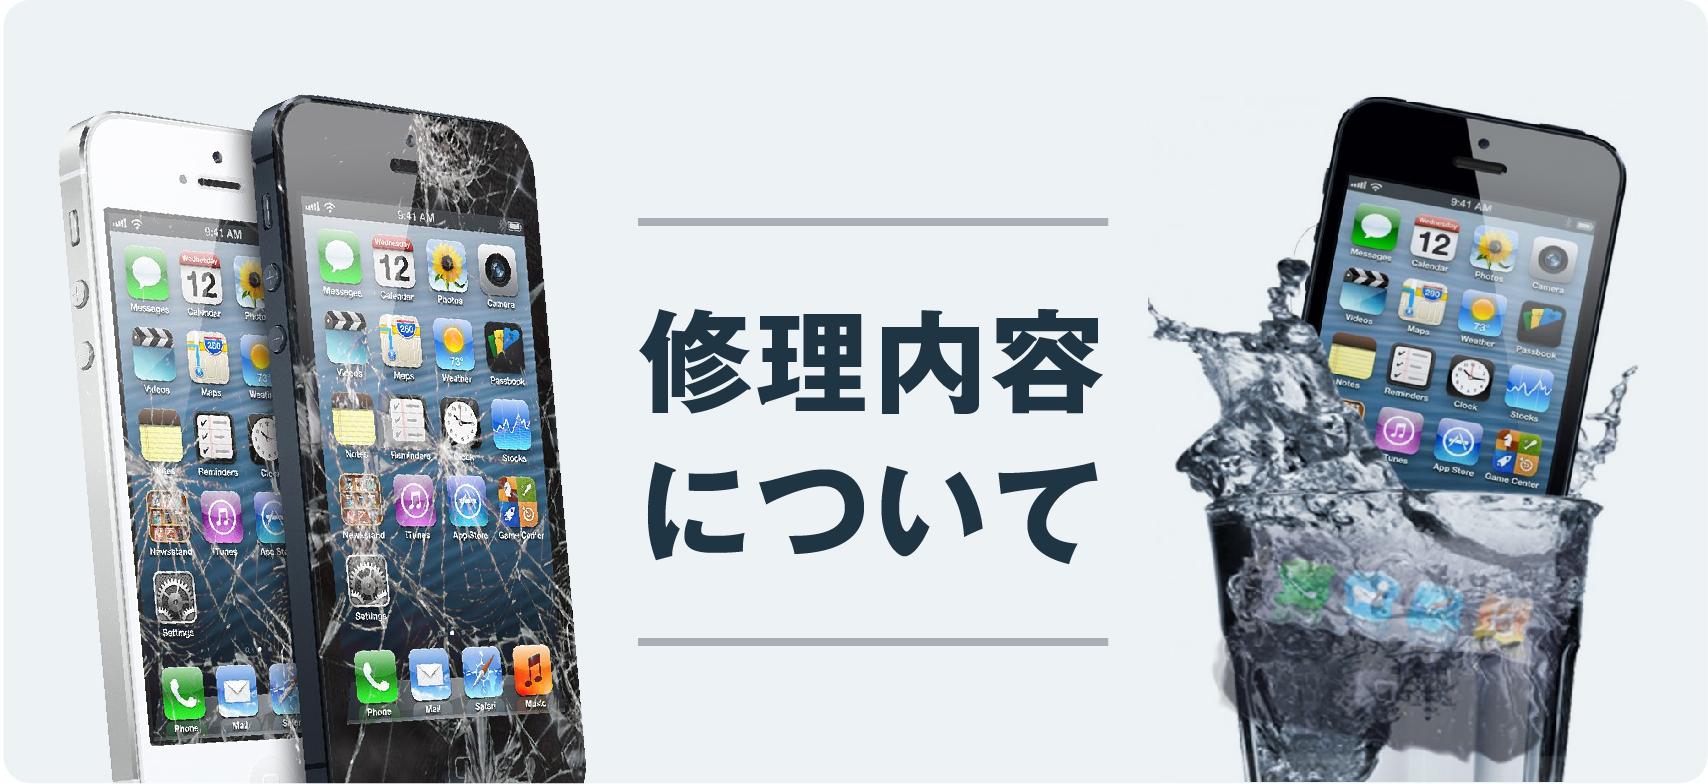 iPhone修理内容ページのアイキャッチ